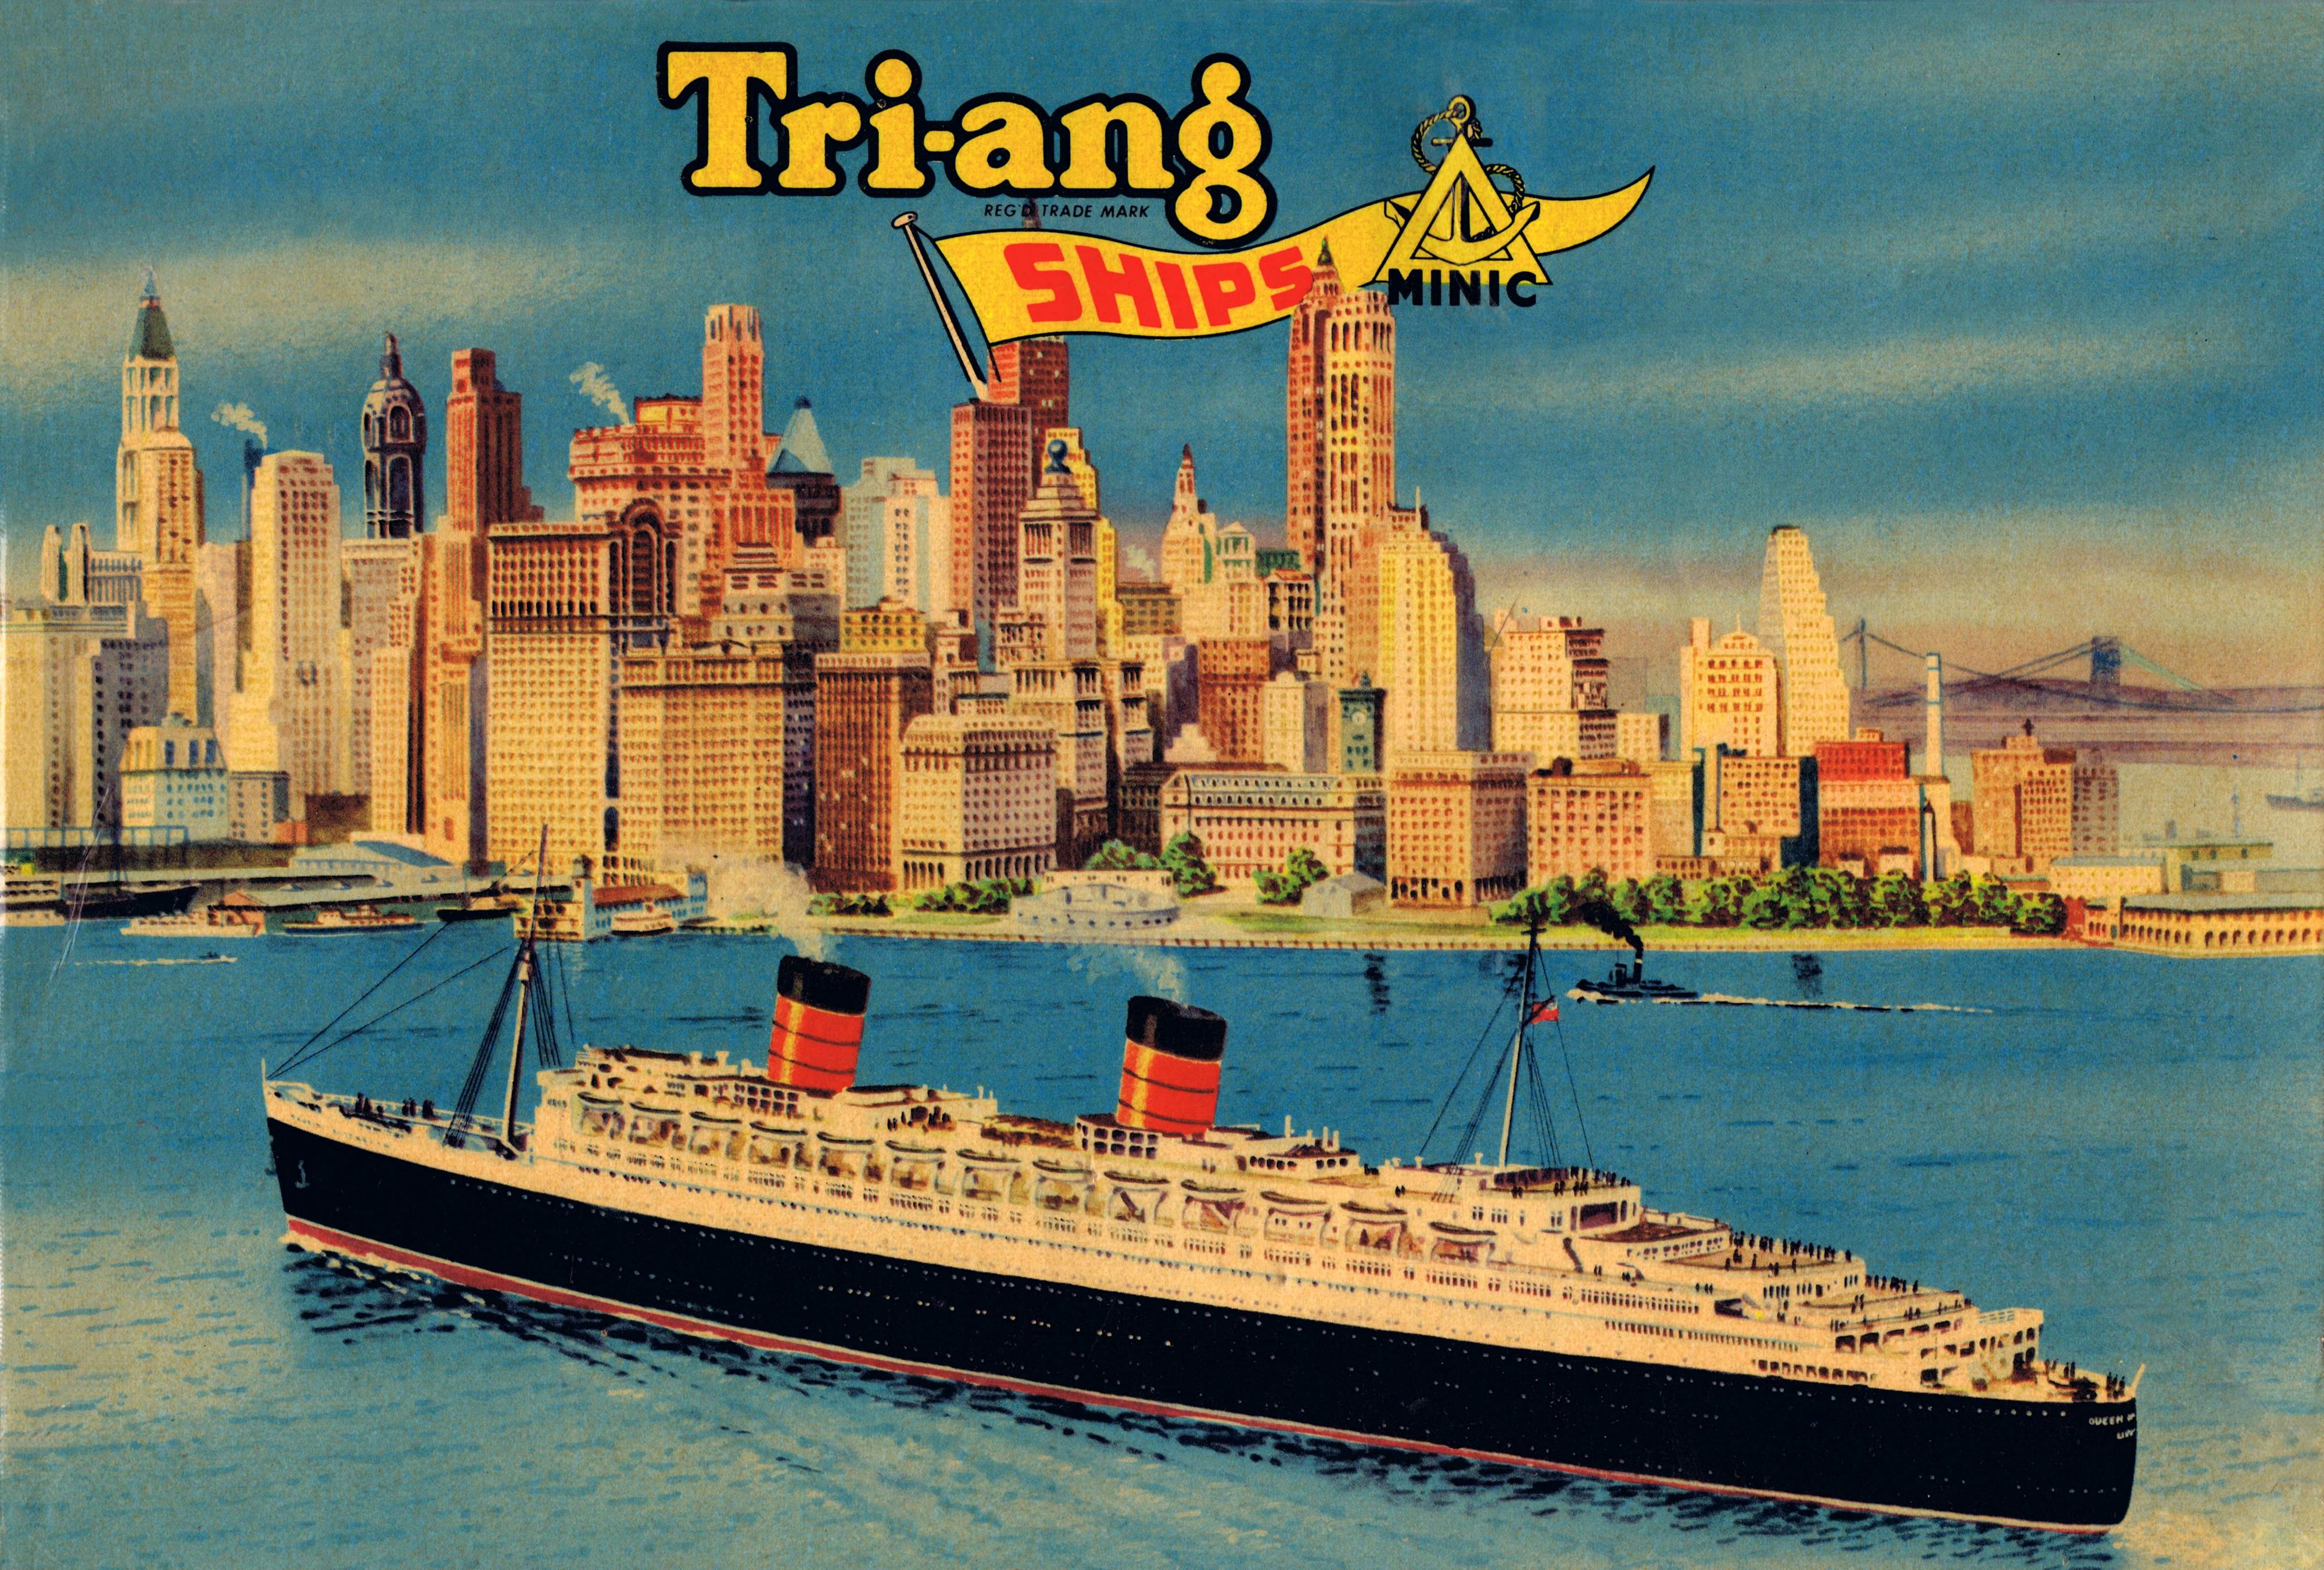 Tri-ang Minic Ships, 1...M Company Logo